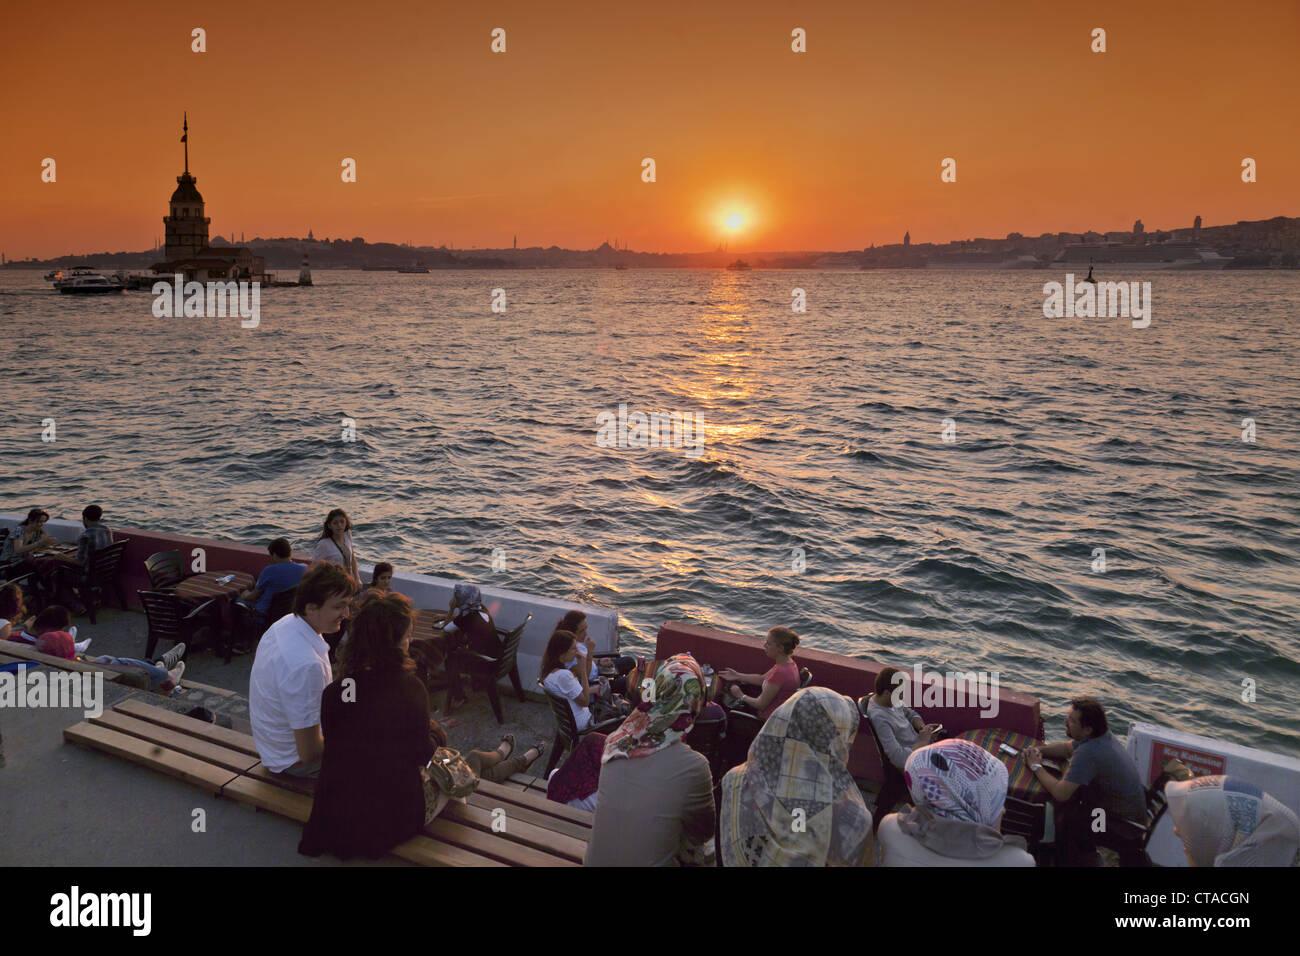 Lounge à bord de Bosphore, Kis Kulesi tower au coucher du soleil, Istanbul, Turquie, Europe Photo Stock